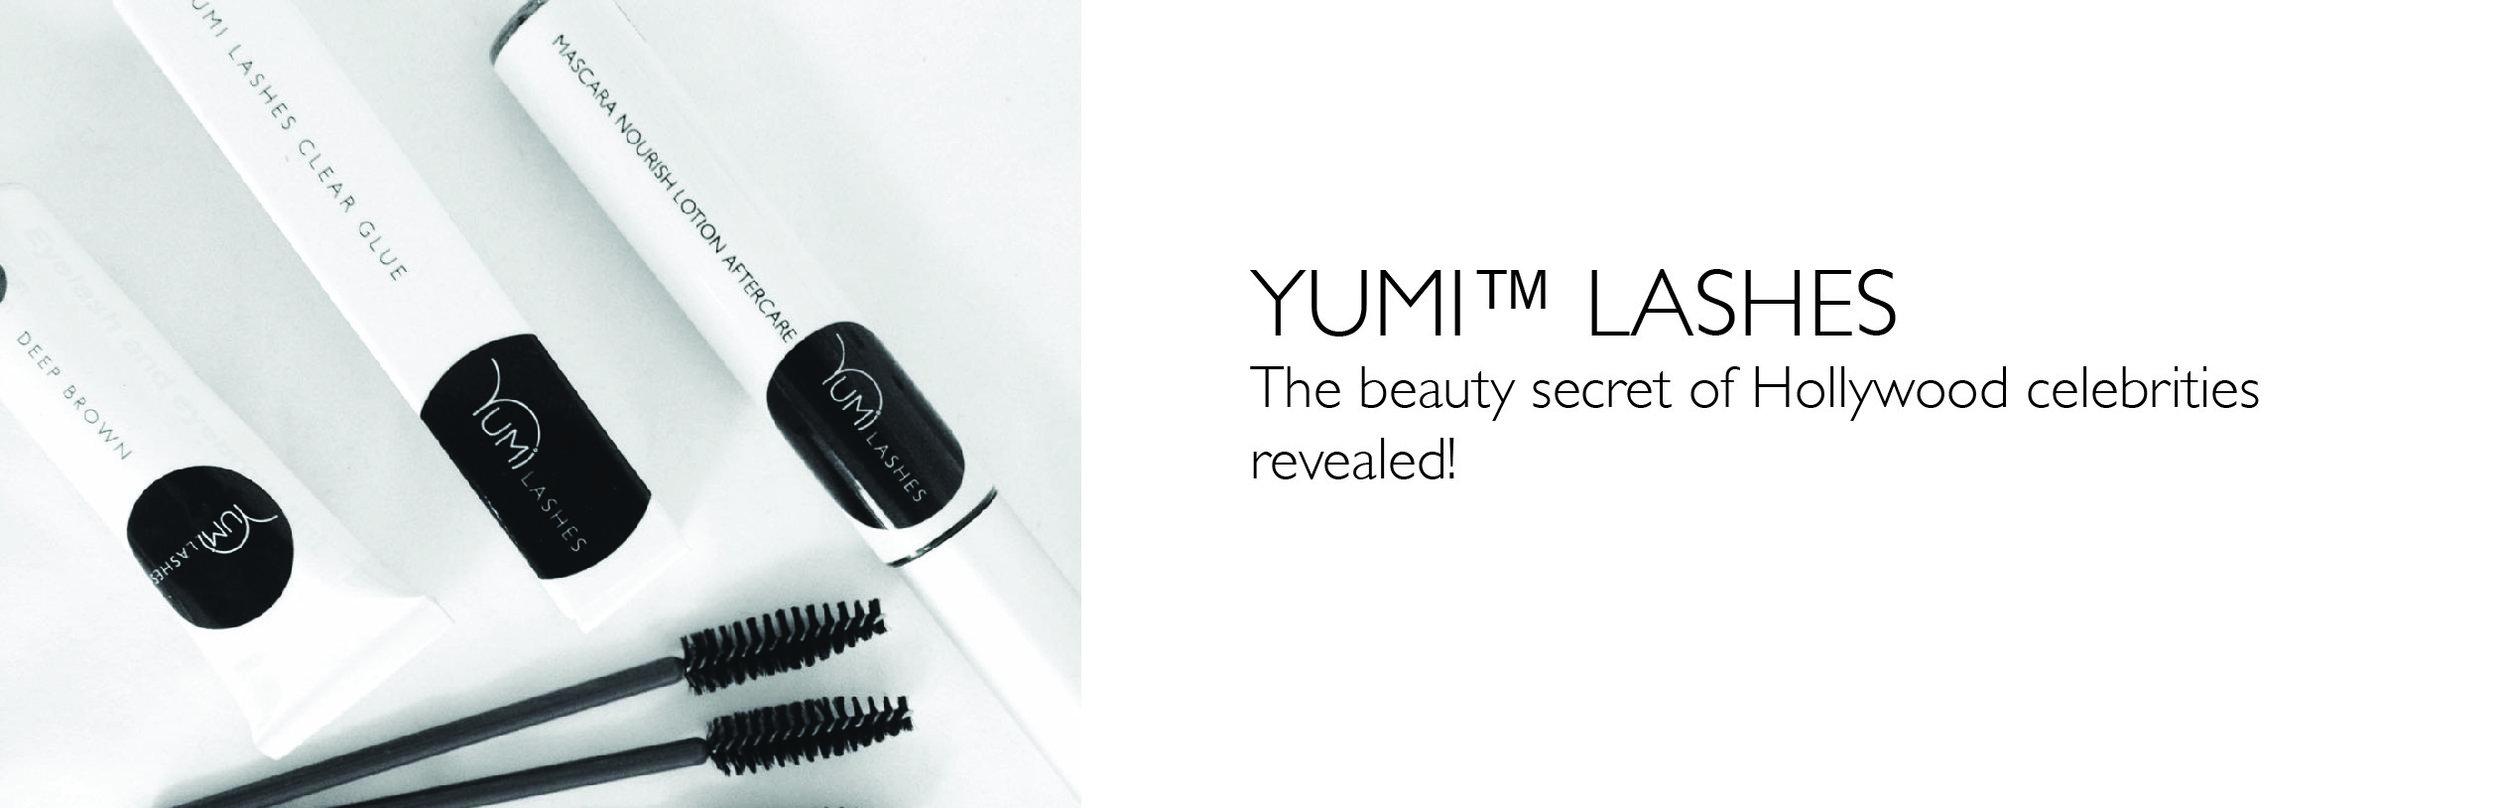 =====  ✦  Secret Garden Beauté | YUMI™ LASHES    by vinci.mua    Keratin Lash Lifting Treatment  📍Rm 1401, 135 Bonham Strand Trade Centre, Sheung Wan, HK |92009281『Appointment ONLY』